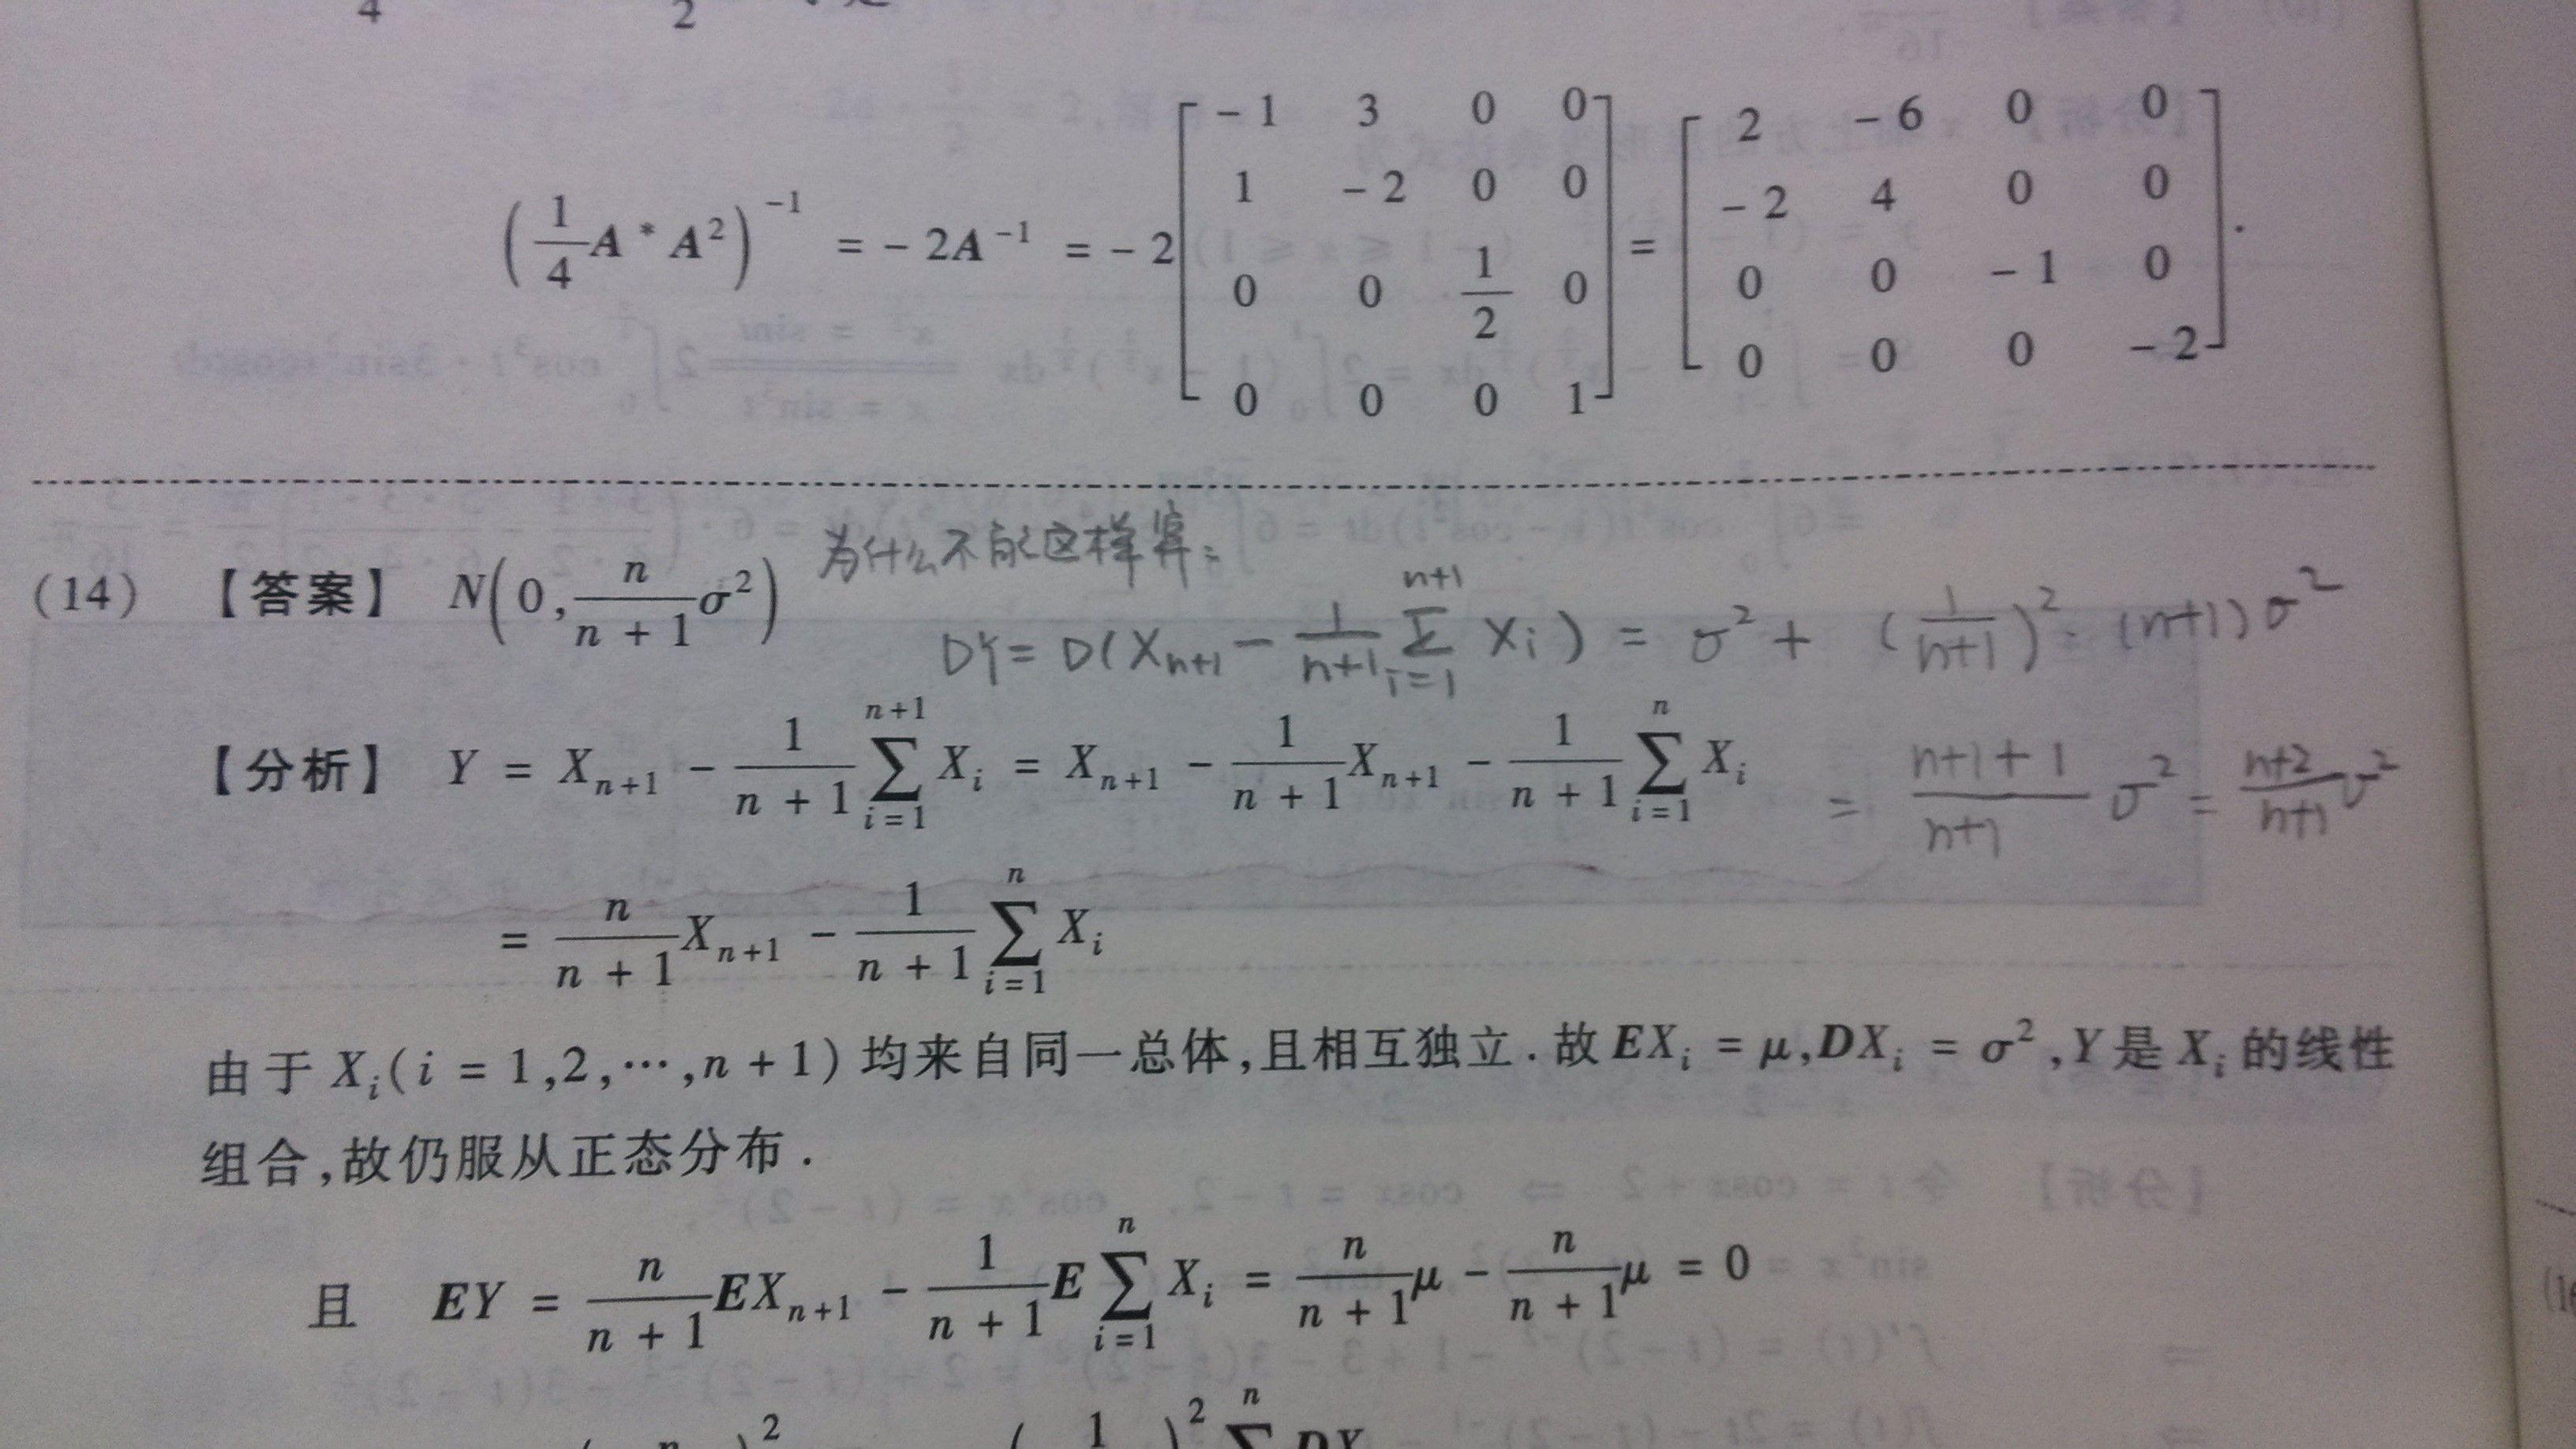 2011考研数学一真题 2014考研数学一真题 2011考研数学真题